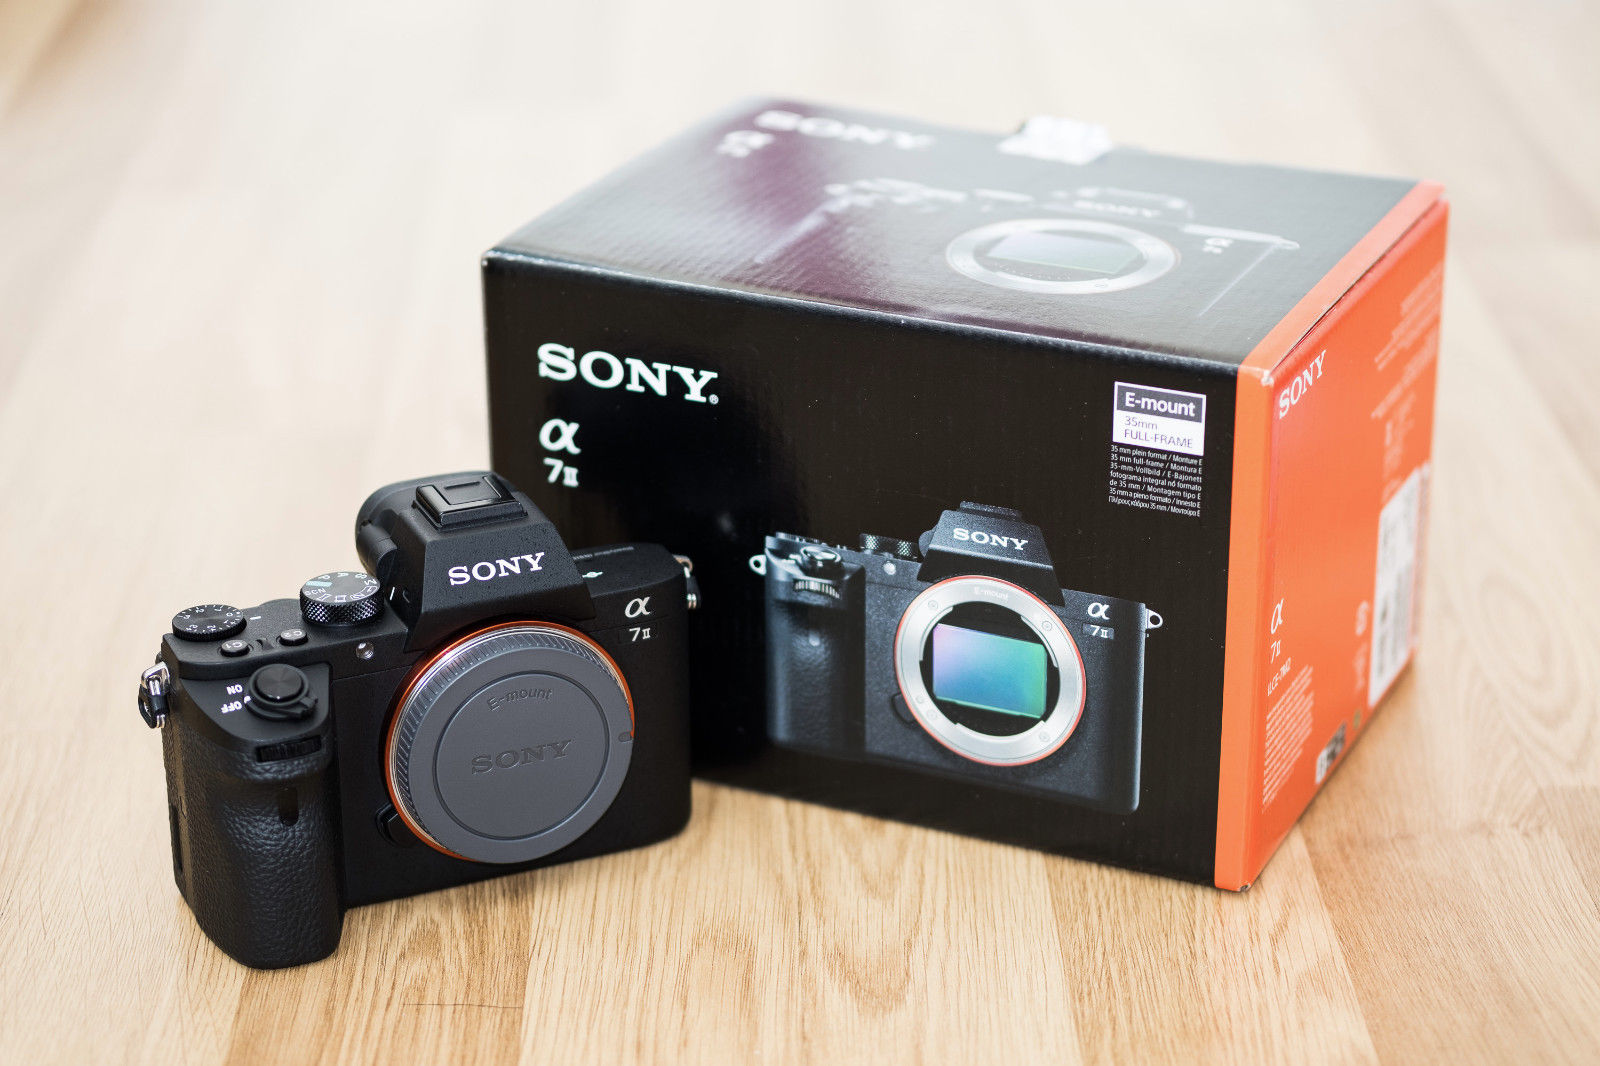 Sony Alpha ILCE-7M2 24.3 (Nur Gehäuse) - A7 II